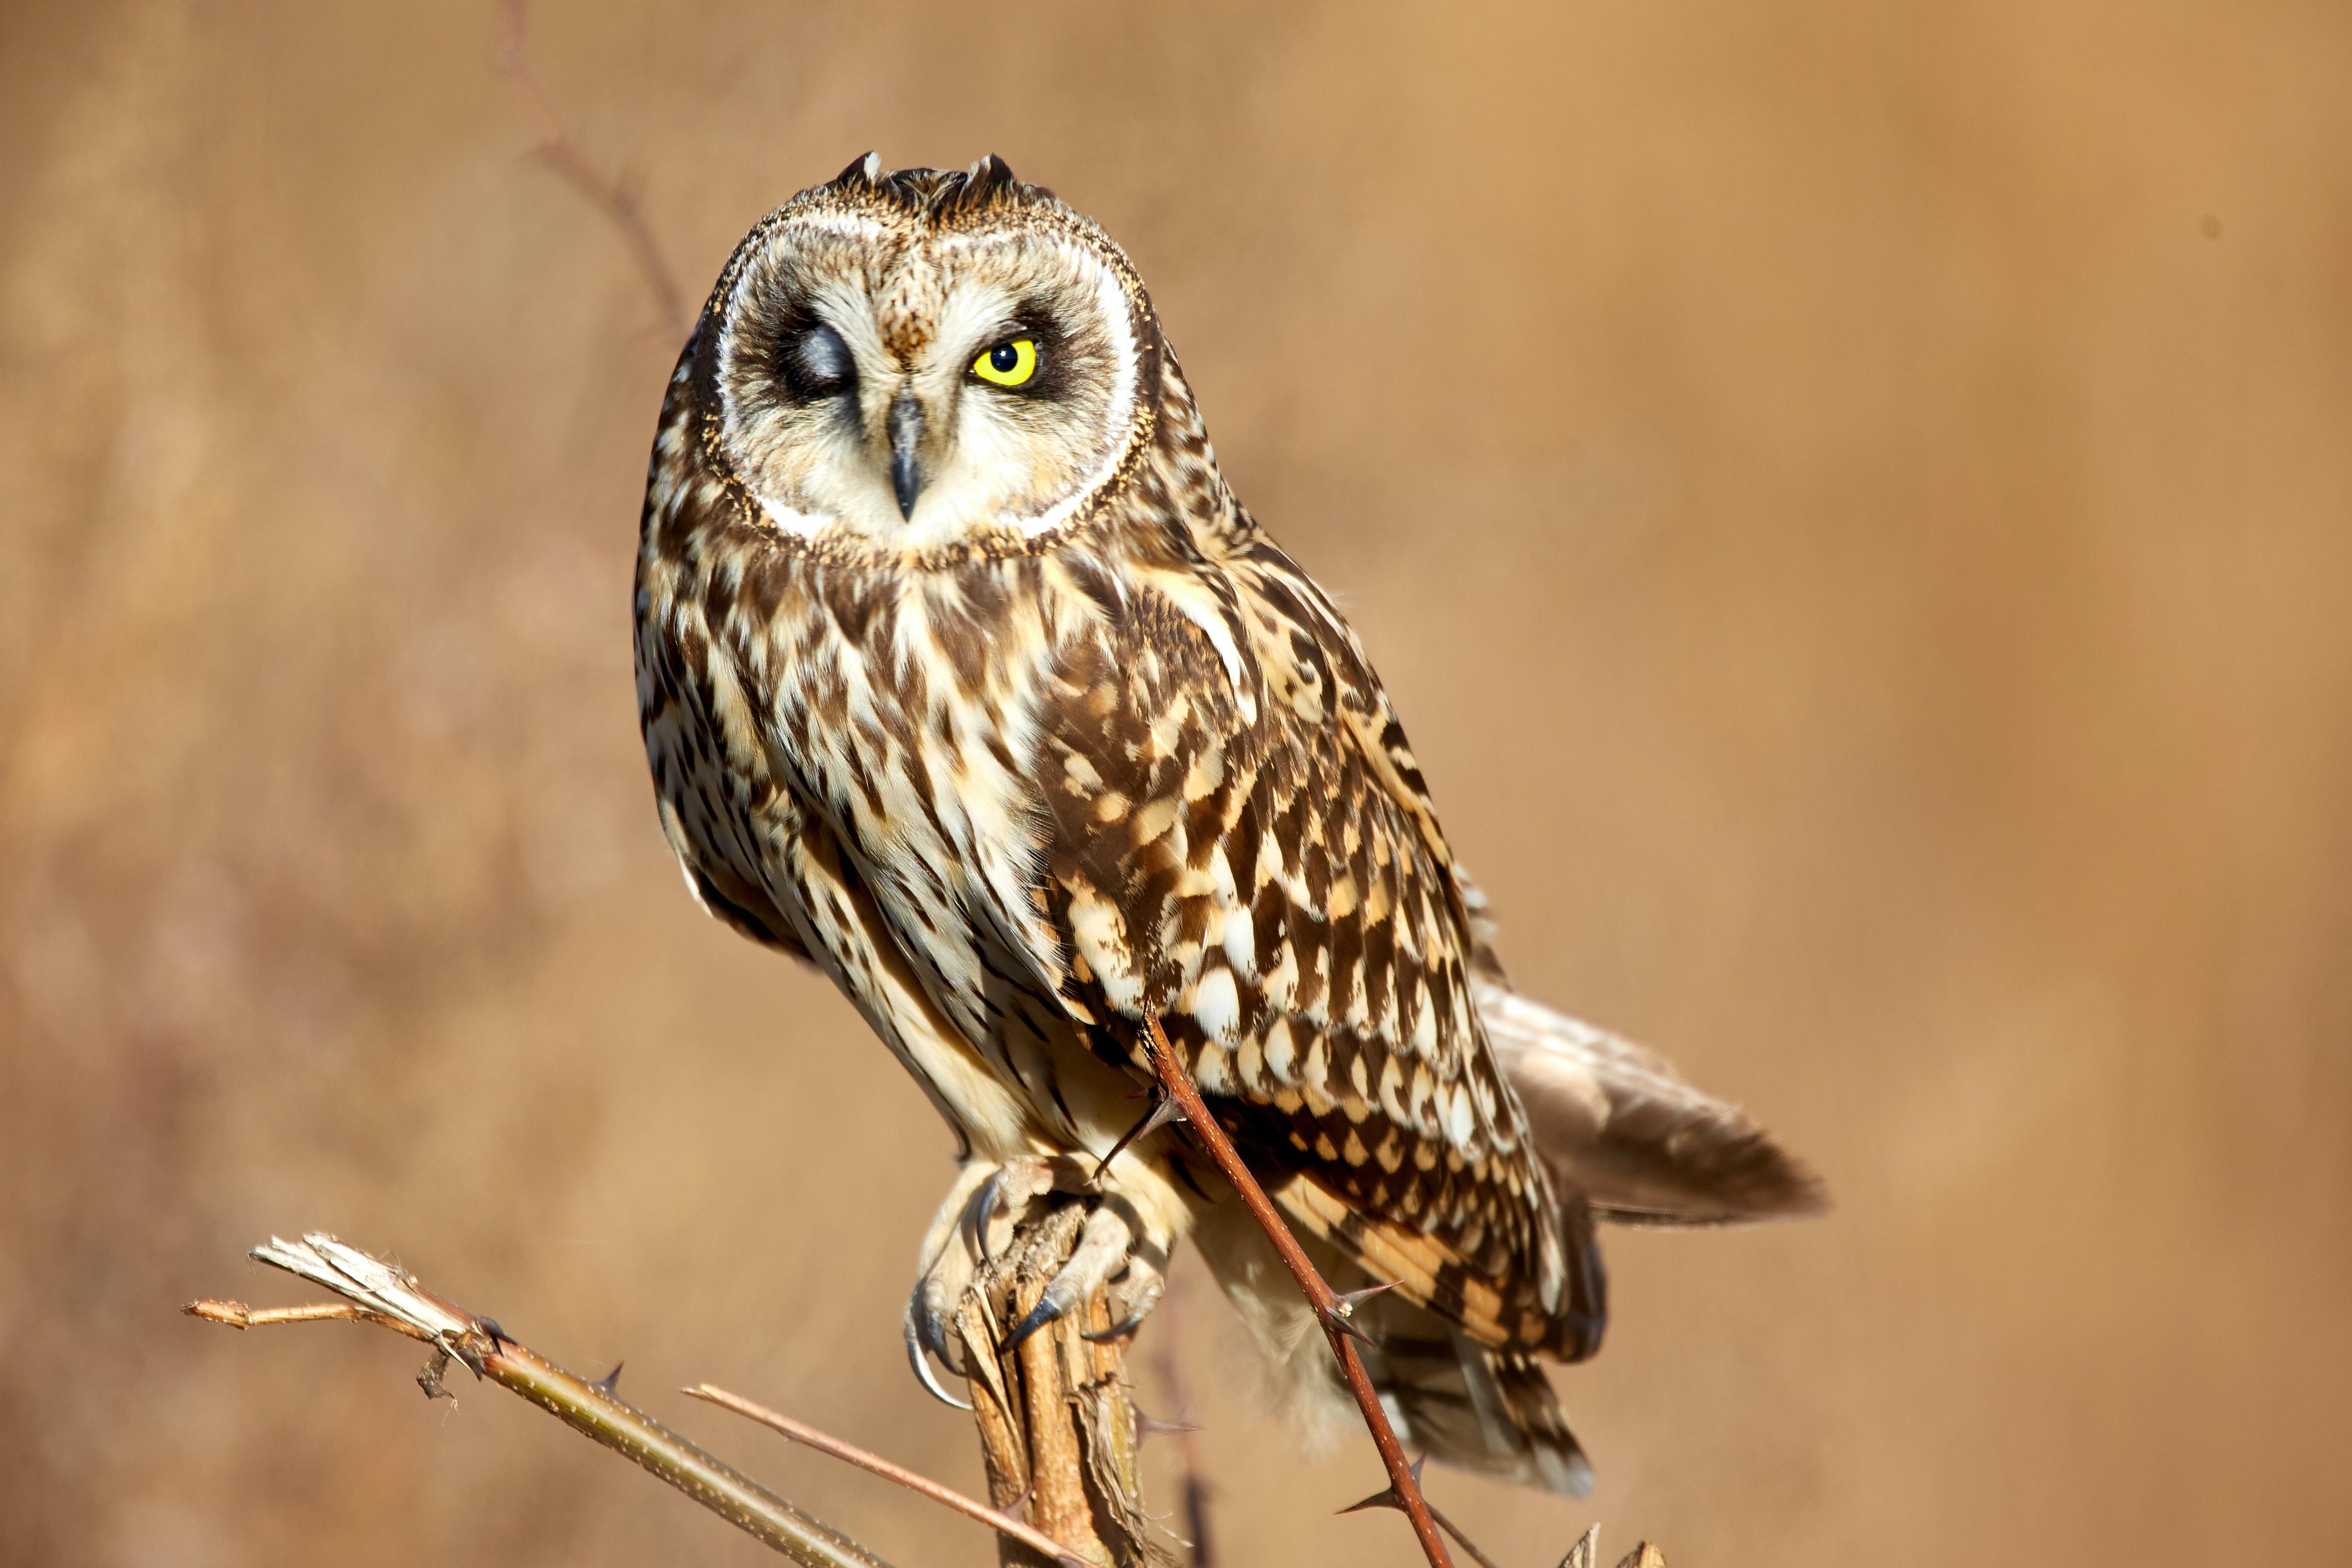 tilt-shift lens photography of brown owl during daytime